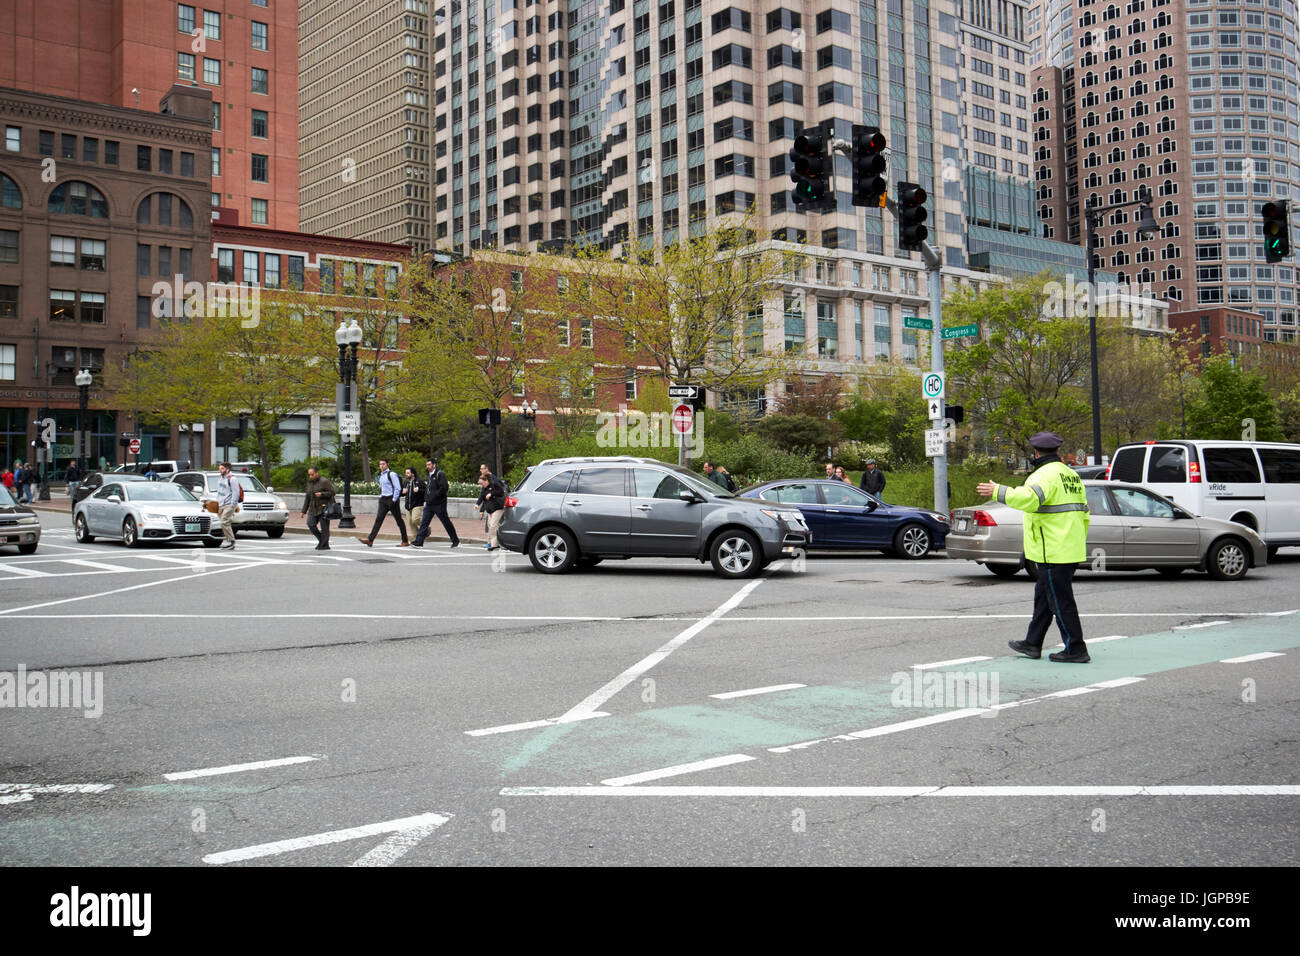 Boston Polizist regelt den Verkehr Innenstadt im beschäftigt Congress street and Atlantic Avenue Kreuzung Boston Stockbild